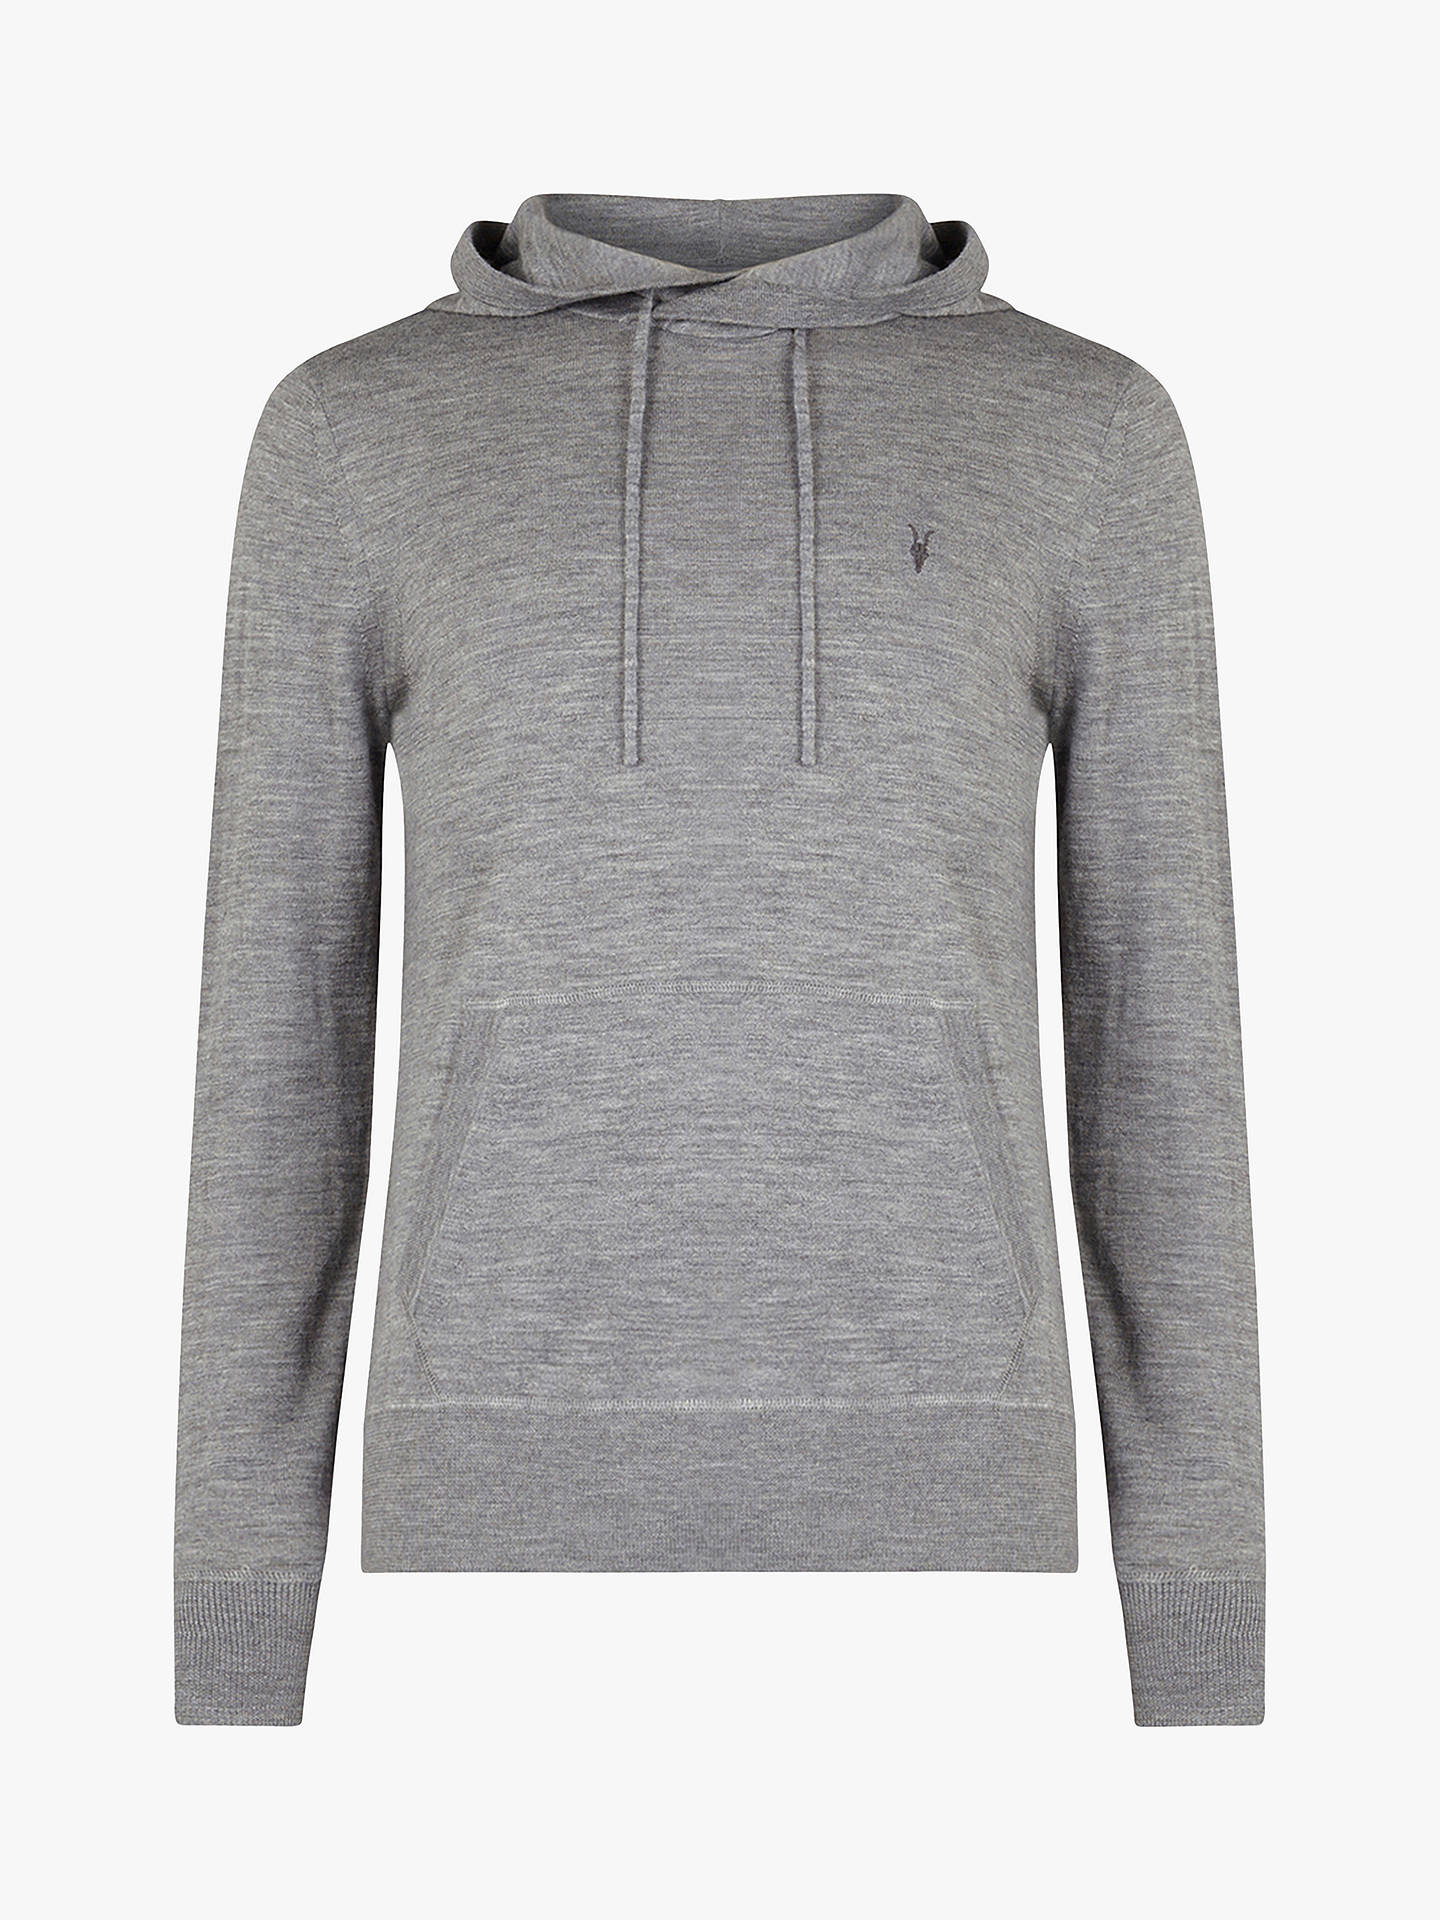 new styles d430e fec30 AllSaints Mode Merino Pullover Hoodie, Grey Marl